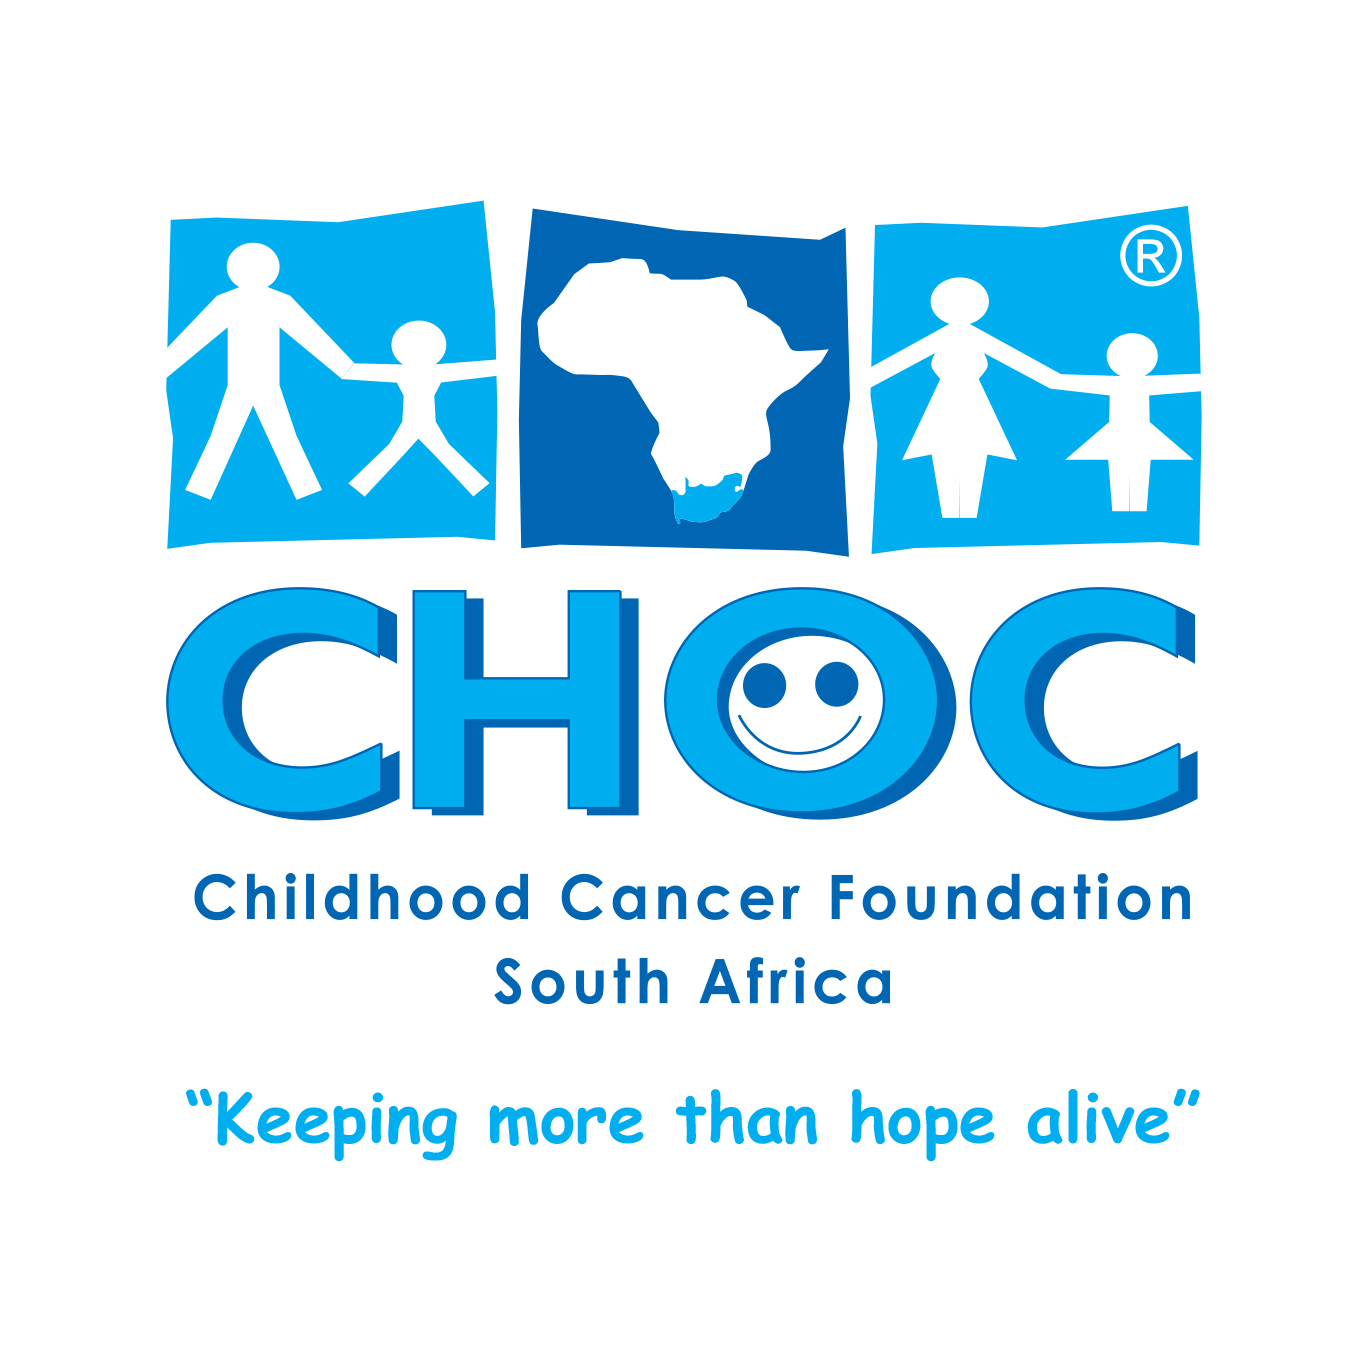 CHOC - Childhood Cancer Foundation SA